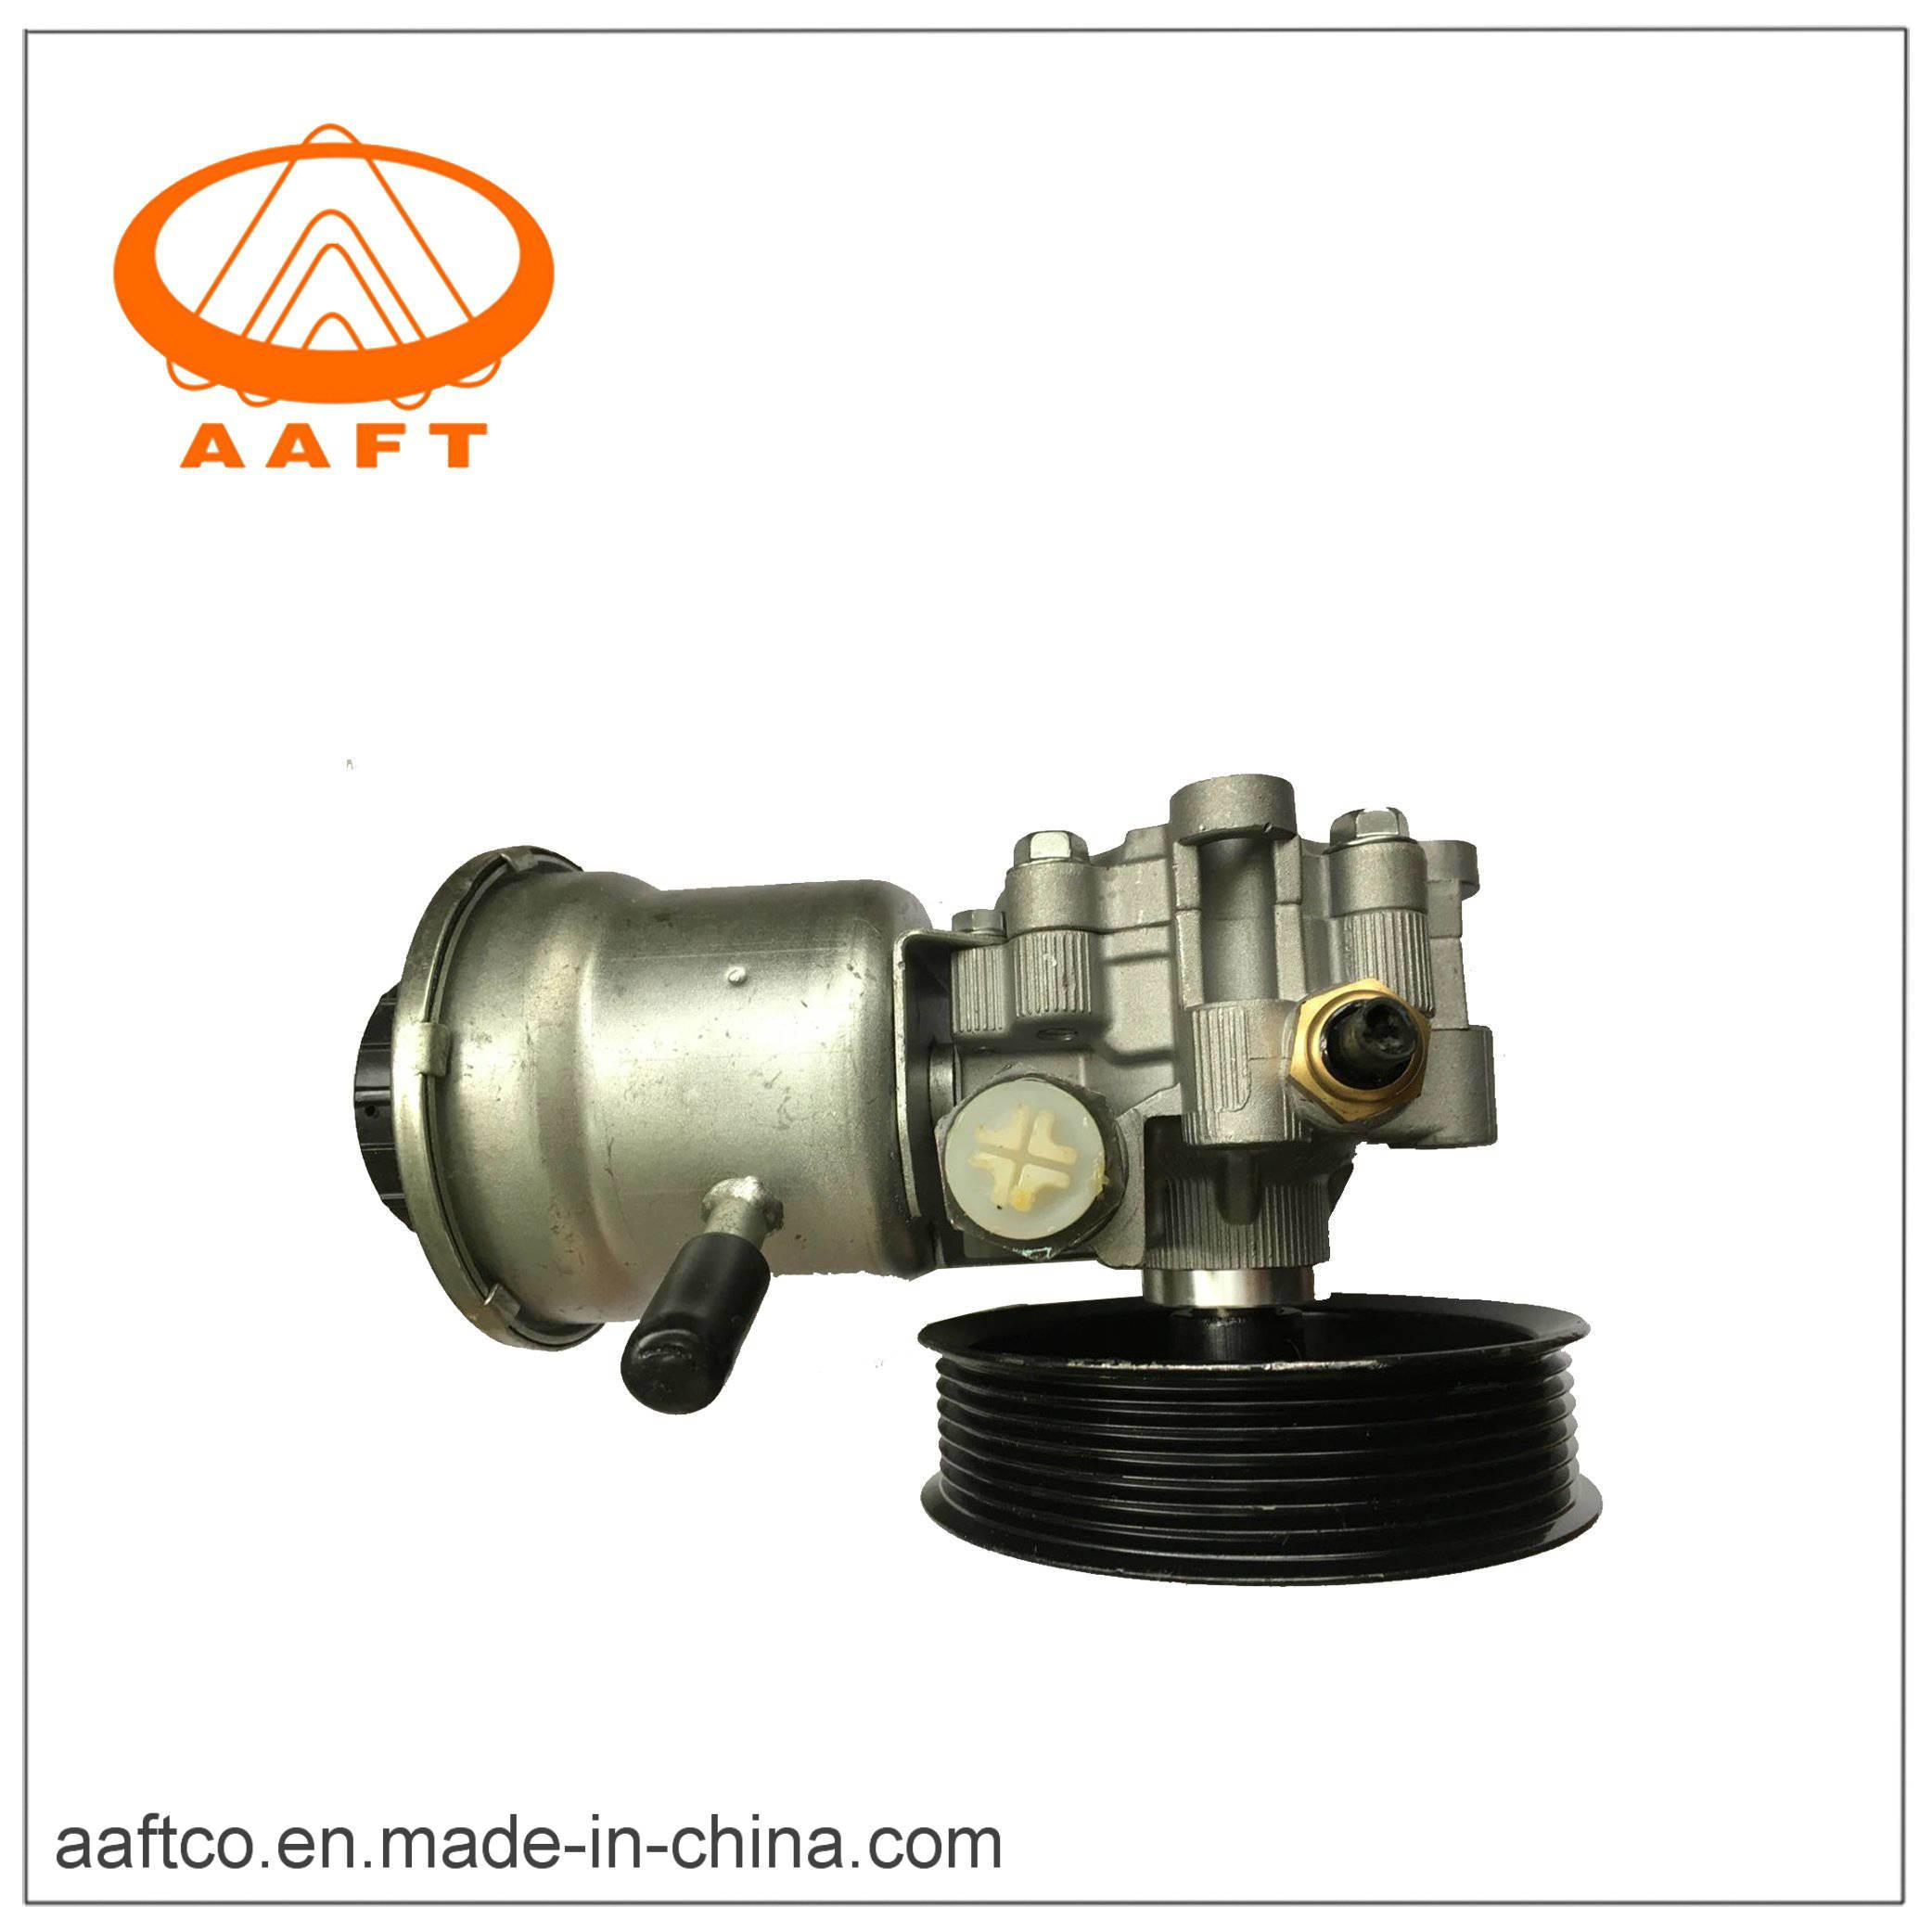 China Hot Sale Automobile Hydraulic Power Steering Pumps for Toyota Innova  Hilux Kijang Vigo (OEM. 44310-0K010) - China Toyota Hilux Kijang Steering  Pump, ...